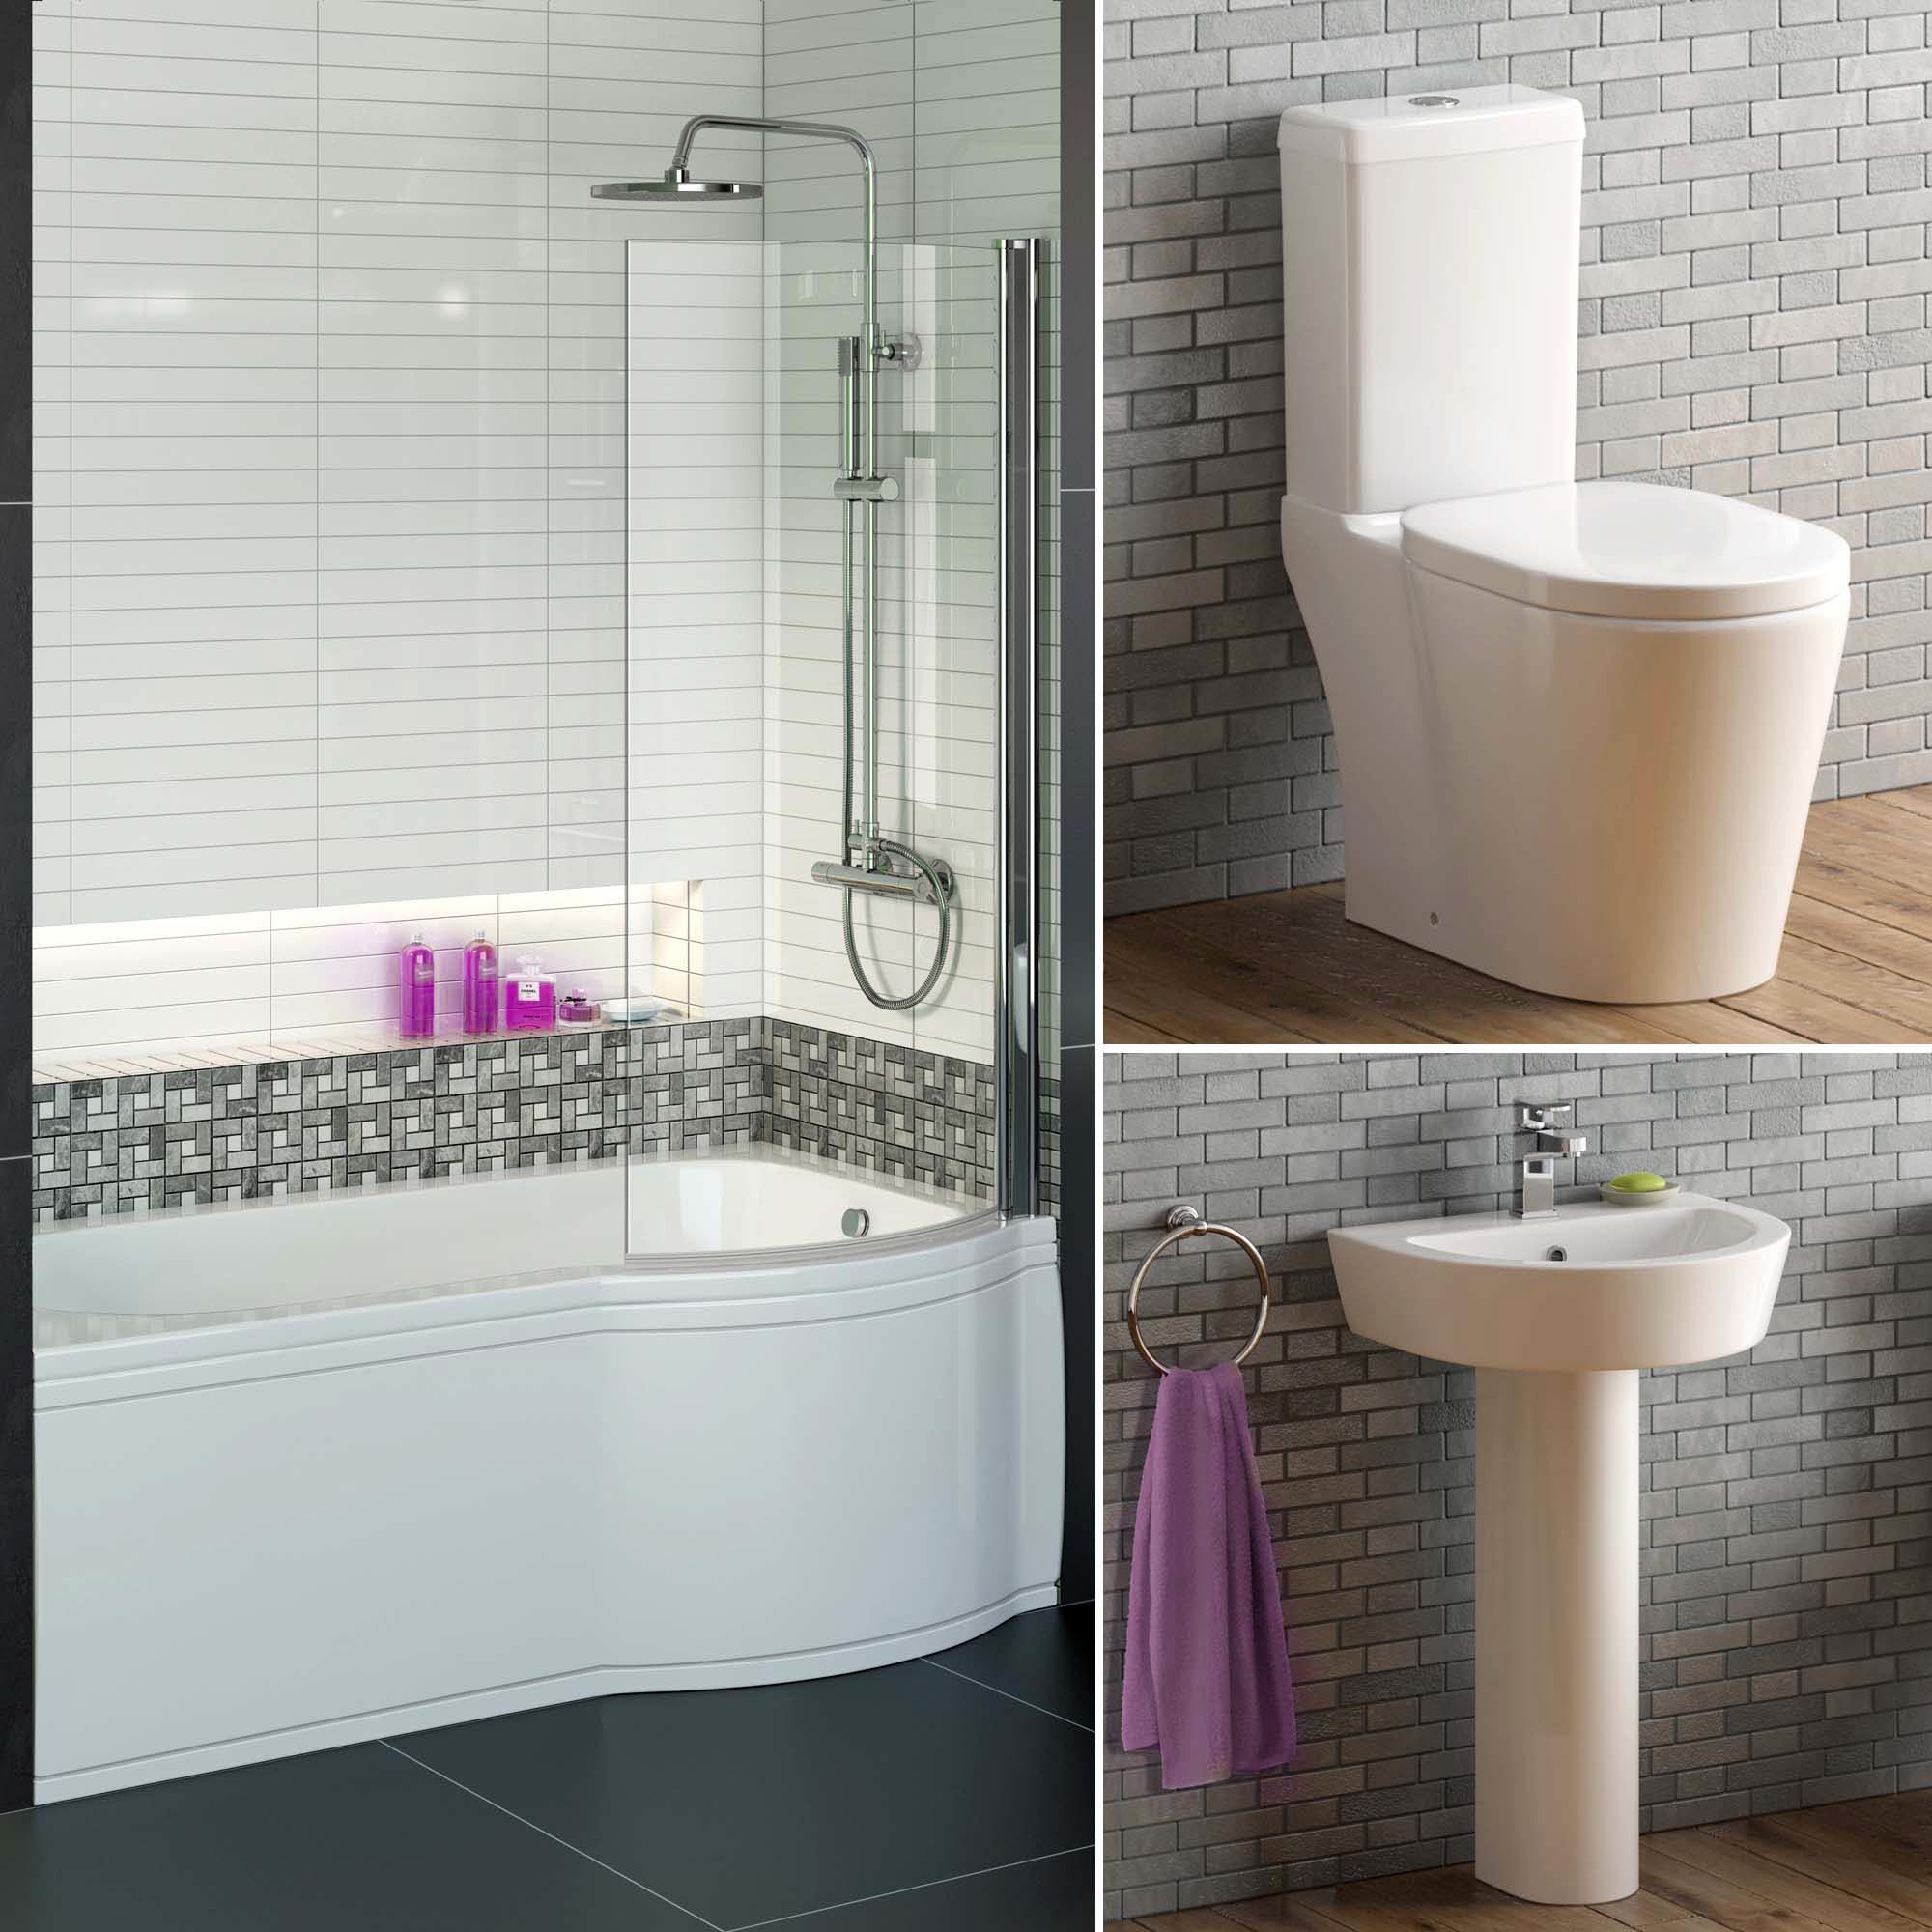 Complete Bathroom Suite With 1700 P Shape Bath And Toilet Plus Basin Pedestal Ebay